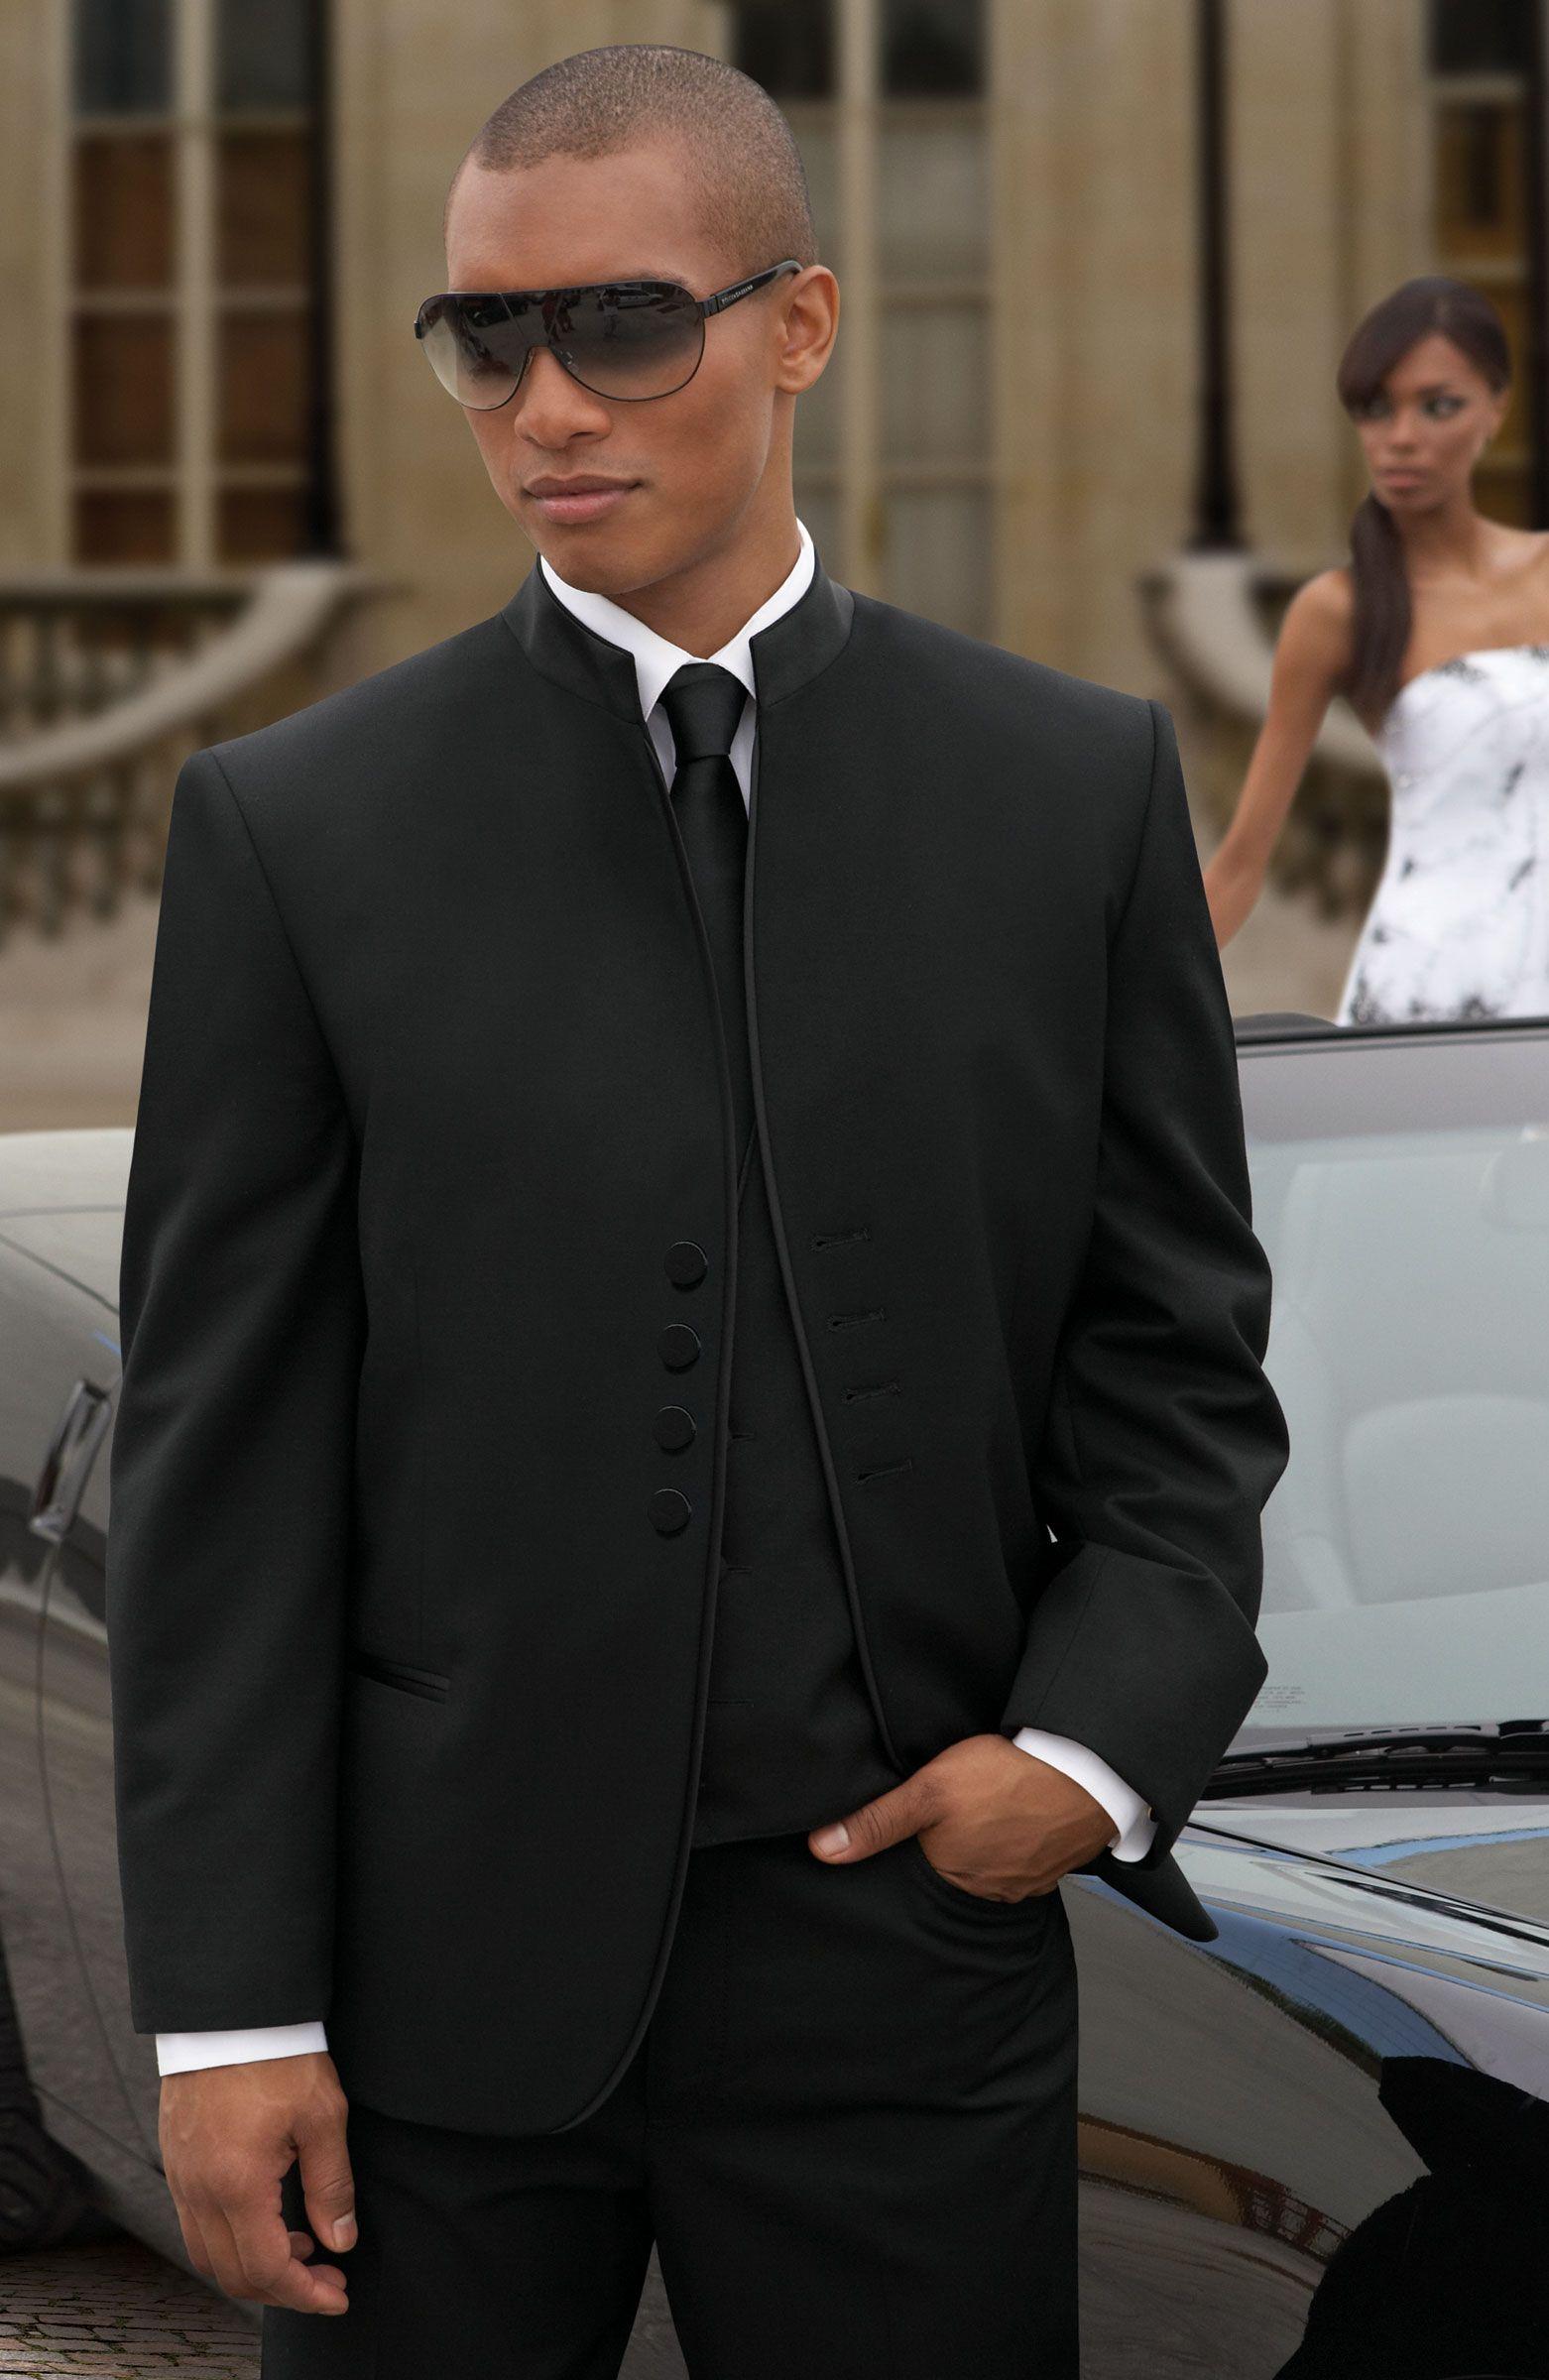 Groom Wear 2014 Wedding Suits